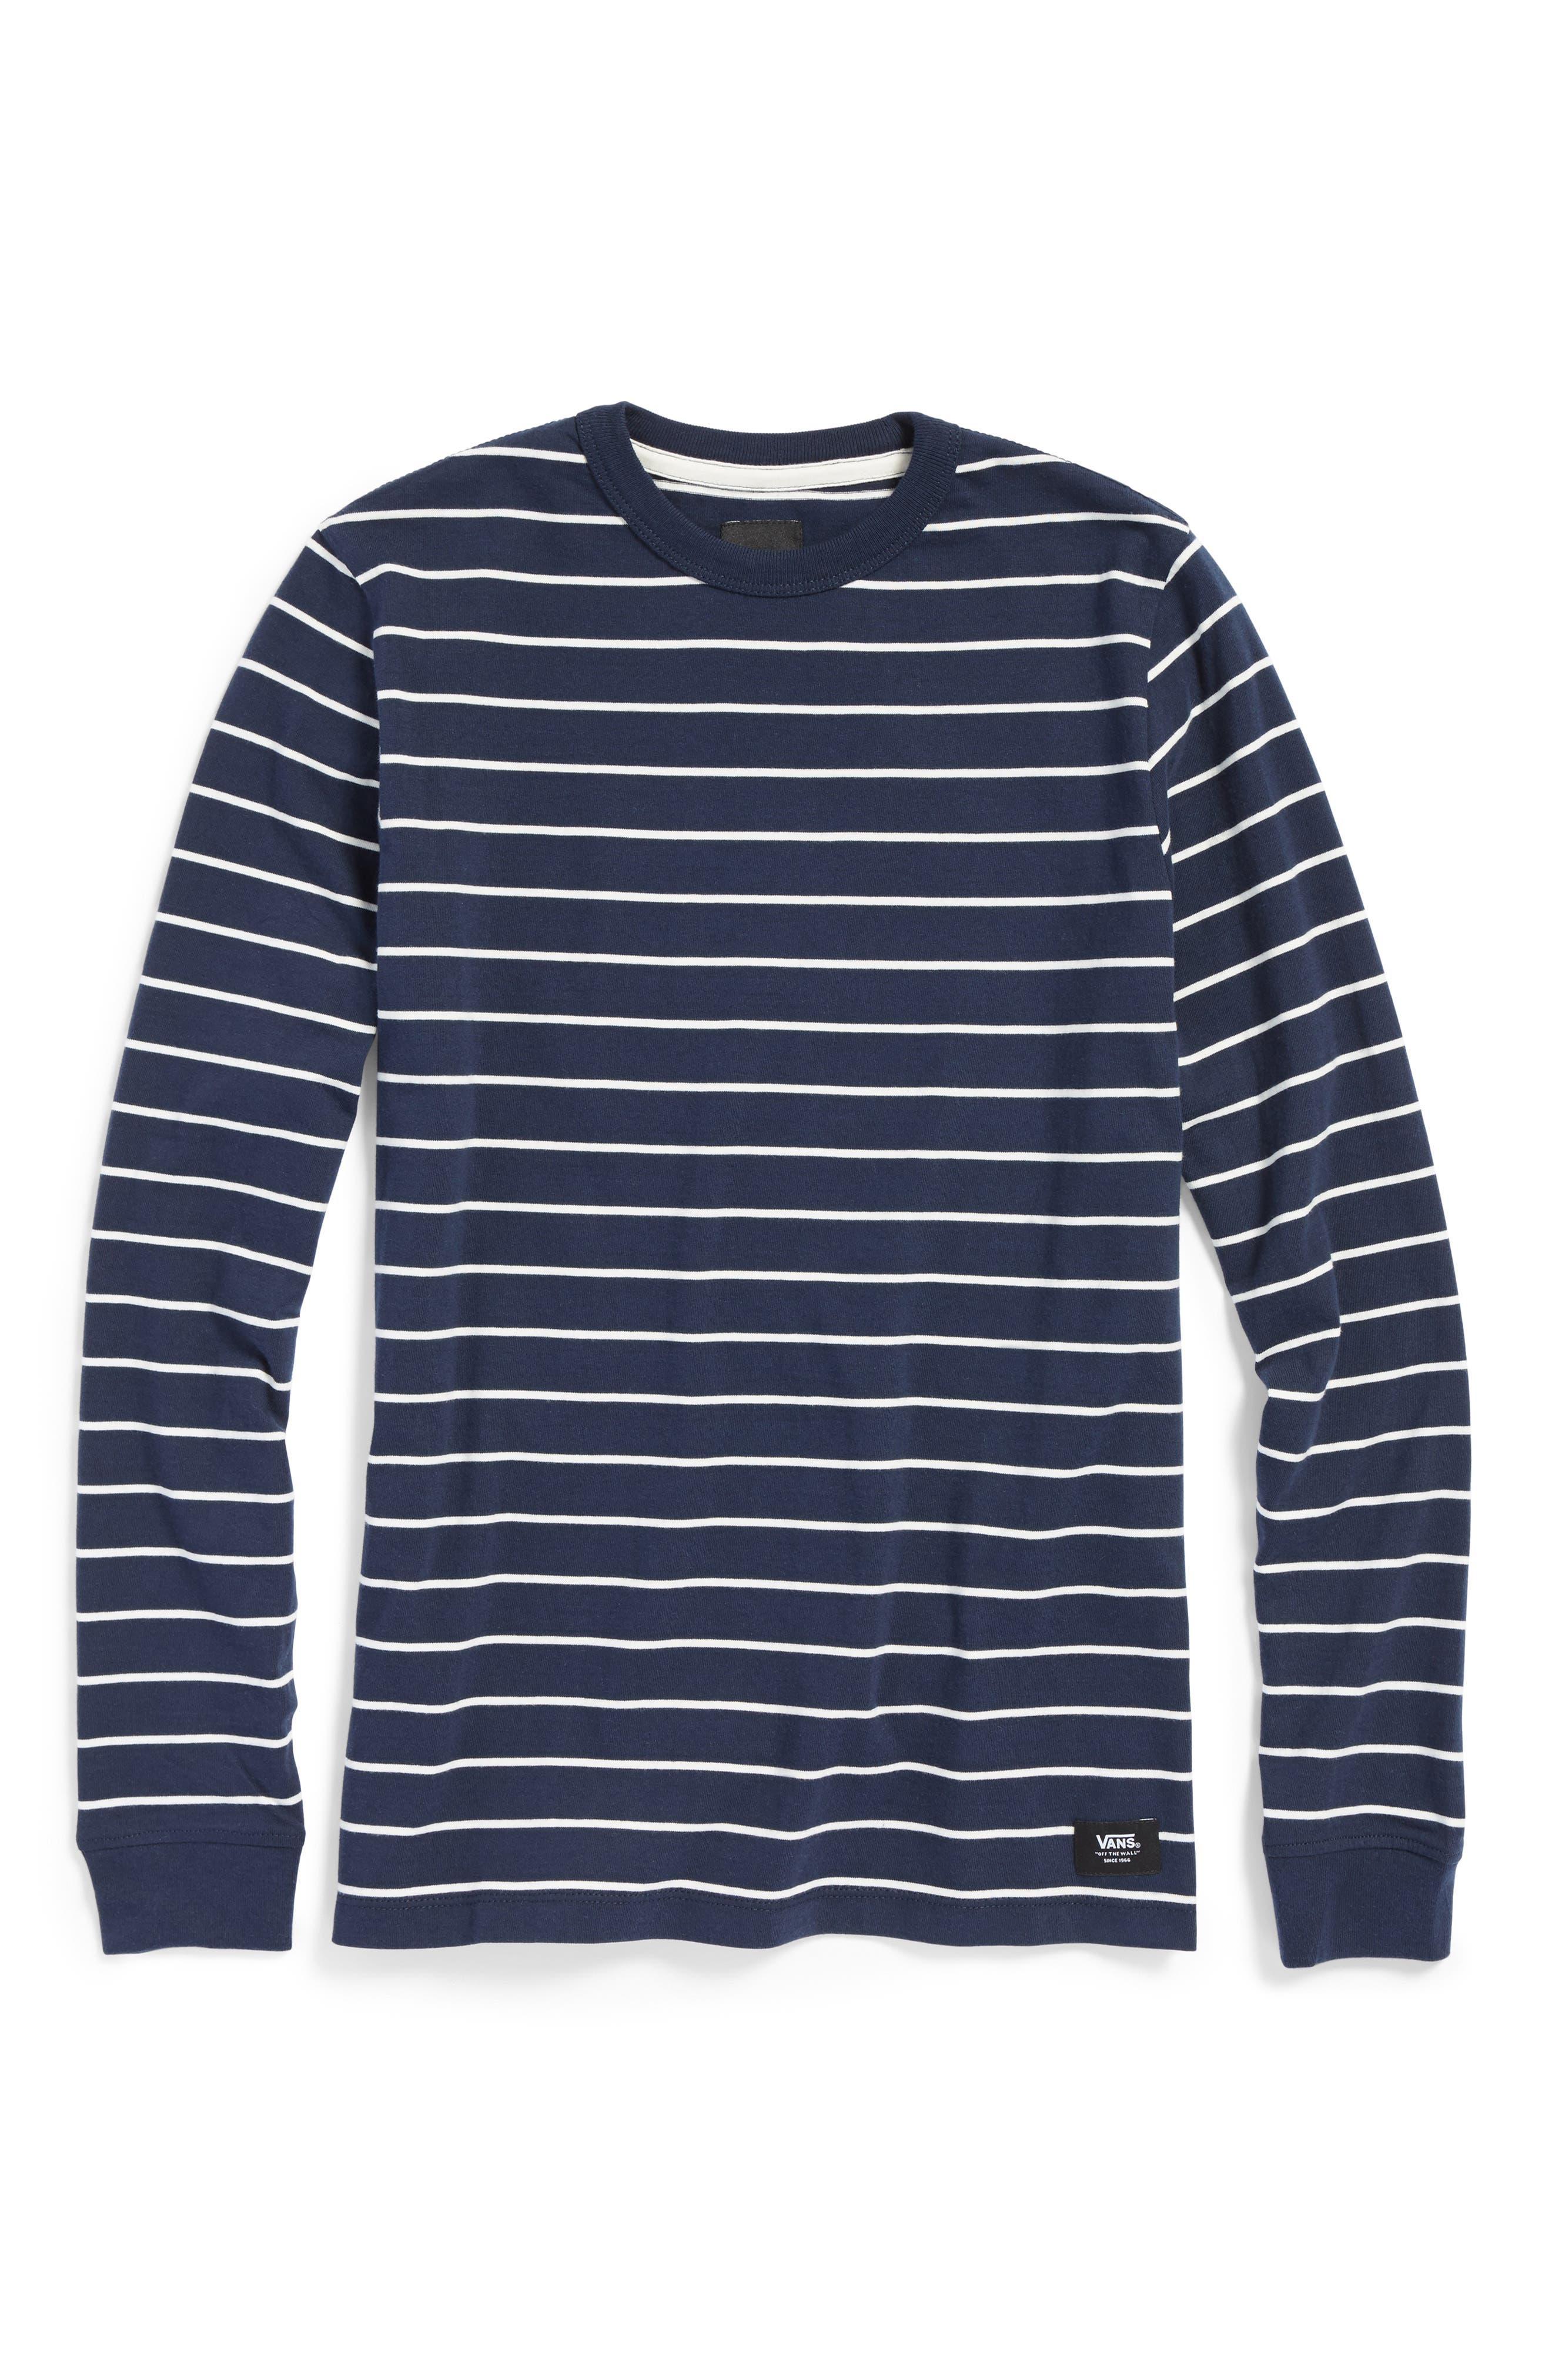 Vans Milton Stripe Long Sleeve T-Shirt (Big Boys)